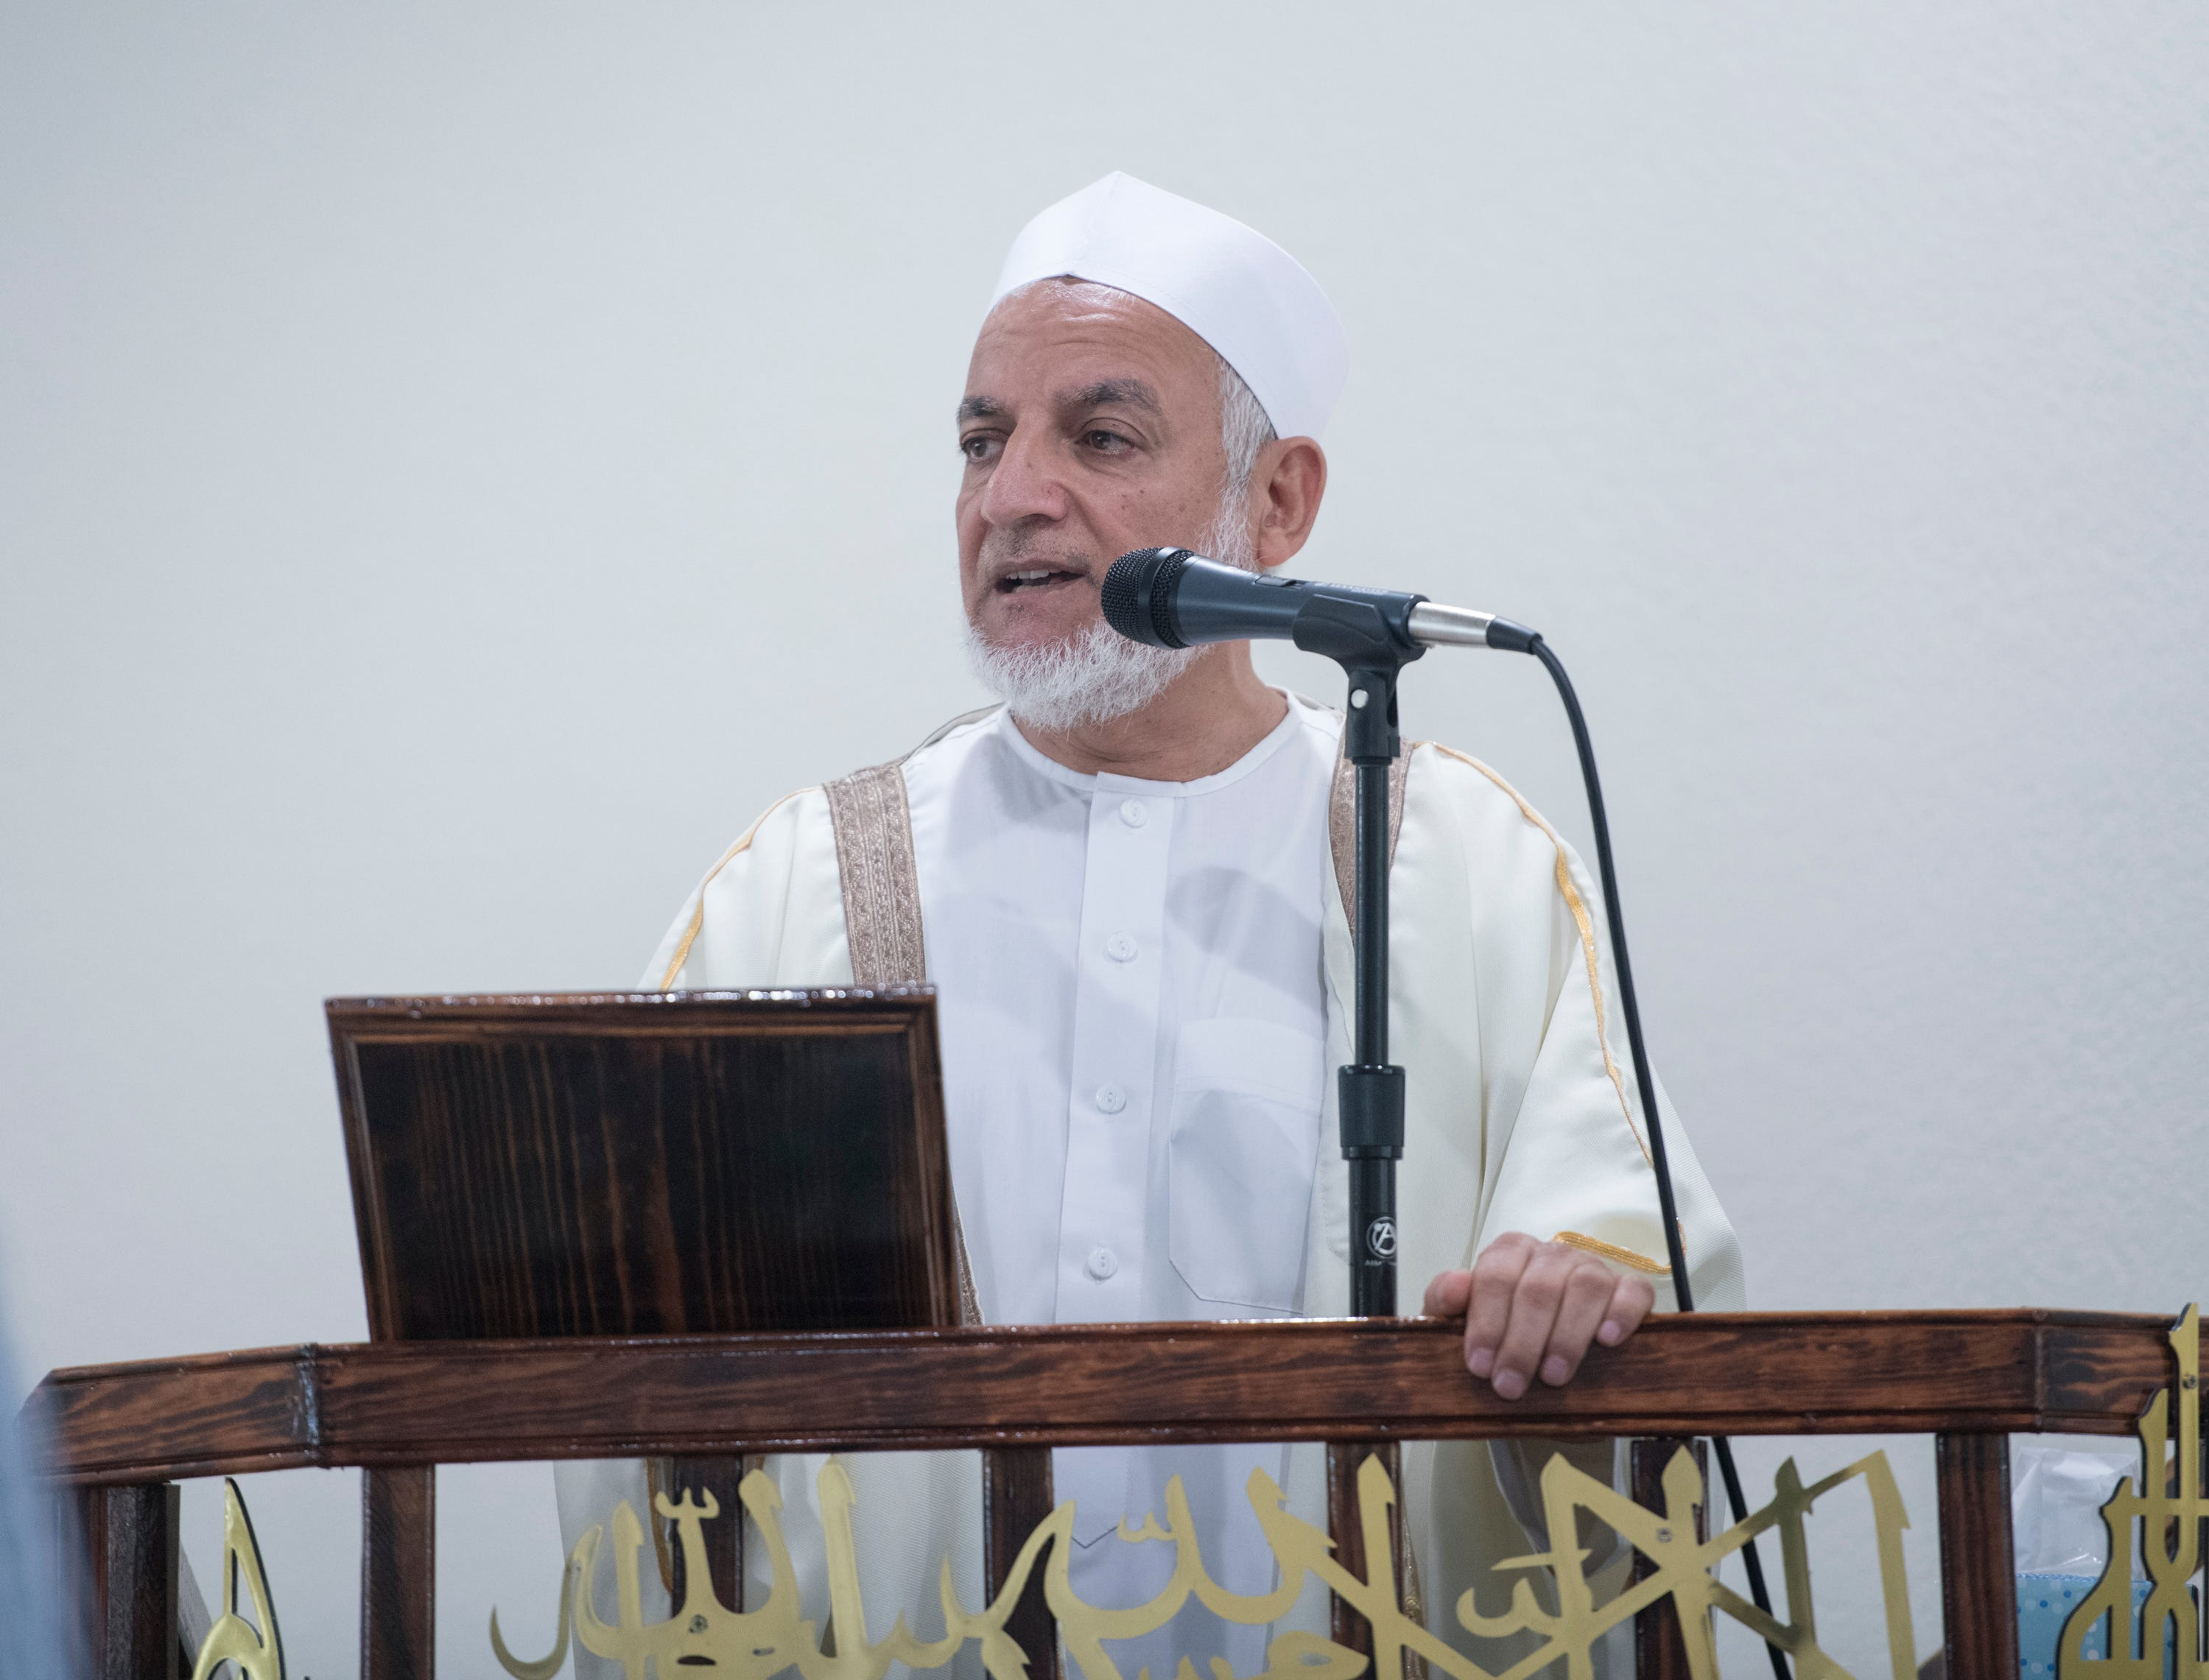 Imam Hosny Ibriham speaks during Jumu'ah (Friday Prayer) at the Islamic Center of Northwest Florida in Pensacola on Friday, March 15, 2019.